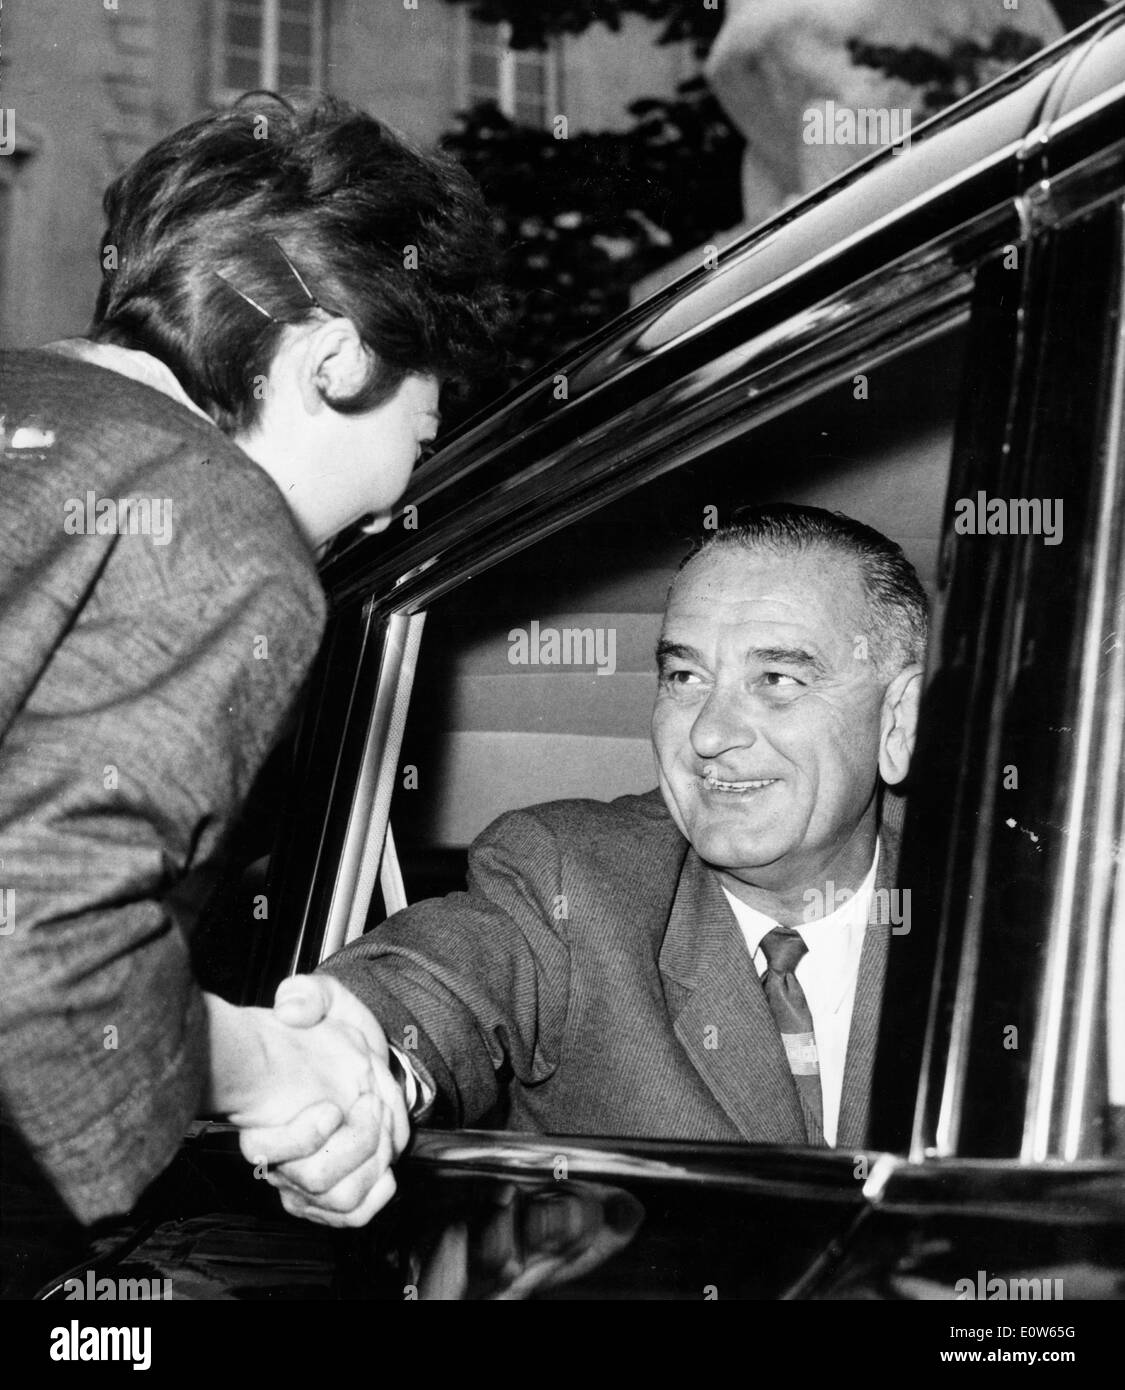 President Johnson greets civilian from car - Stock Image